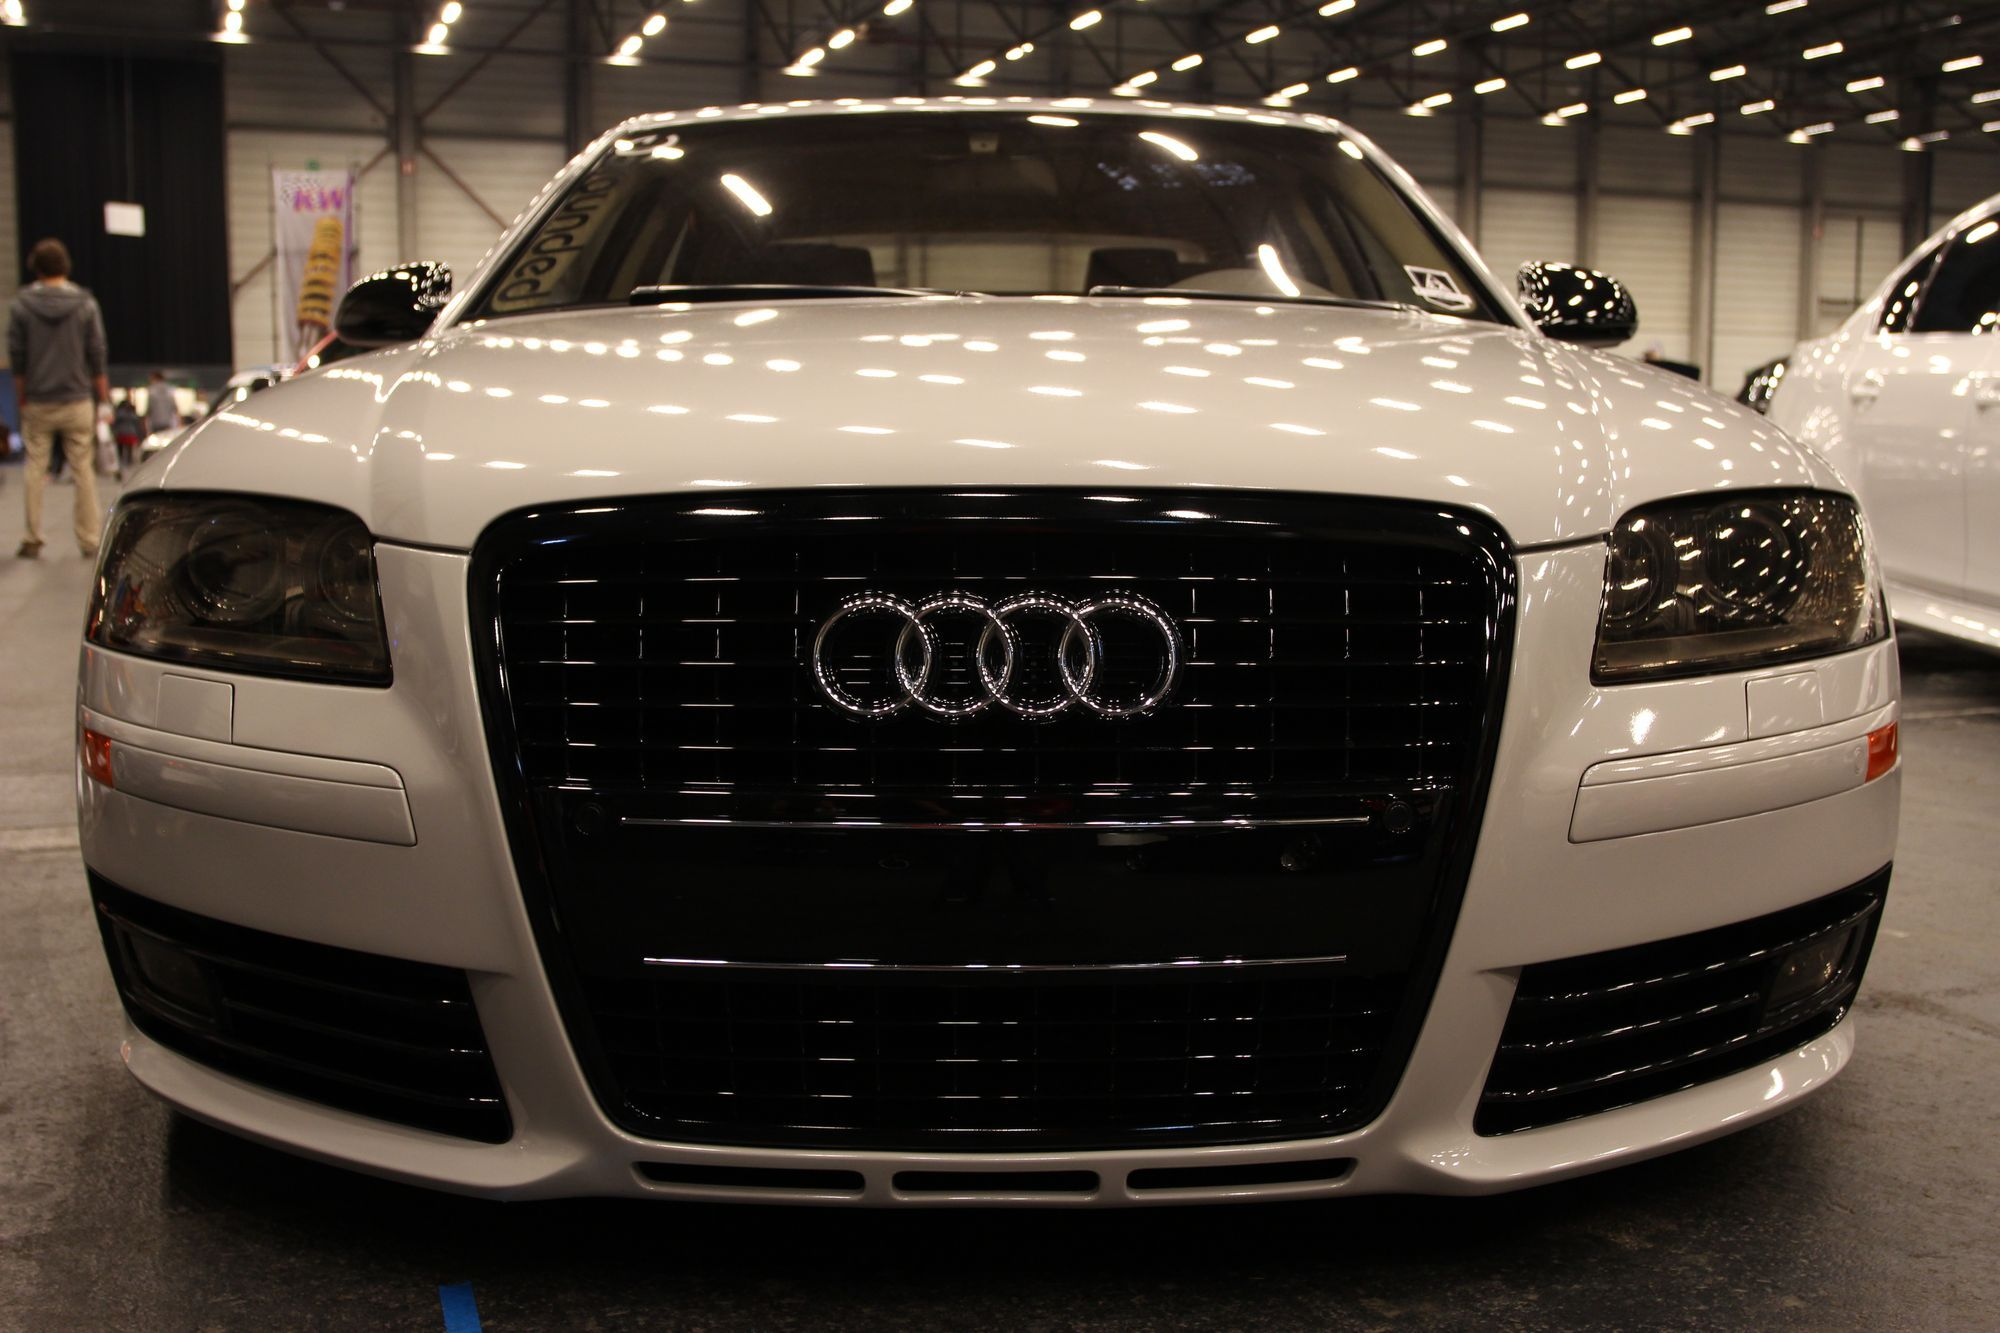 Audi A8 im VIP-Style  http://www.autotuning.de/audi-a8-im-vip-style/ A8, Audi, Porsche-Felgen, S8, VIP-Style